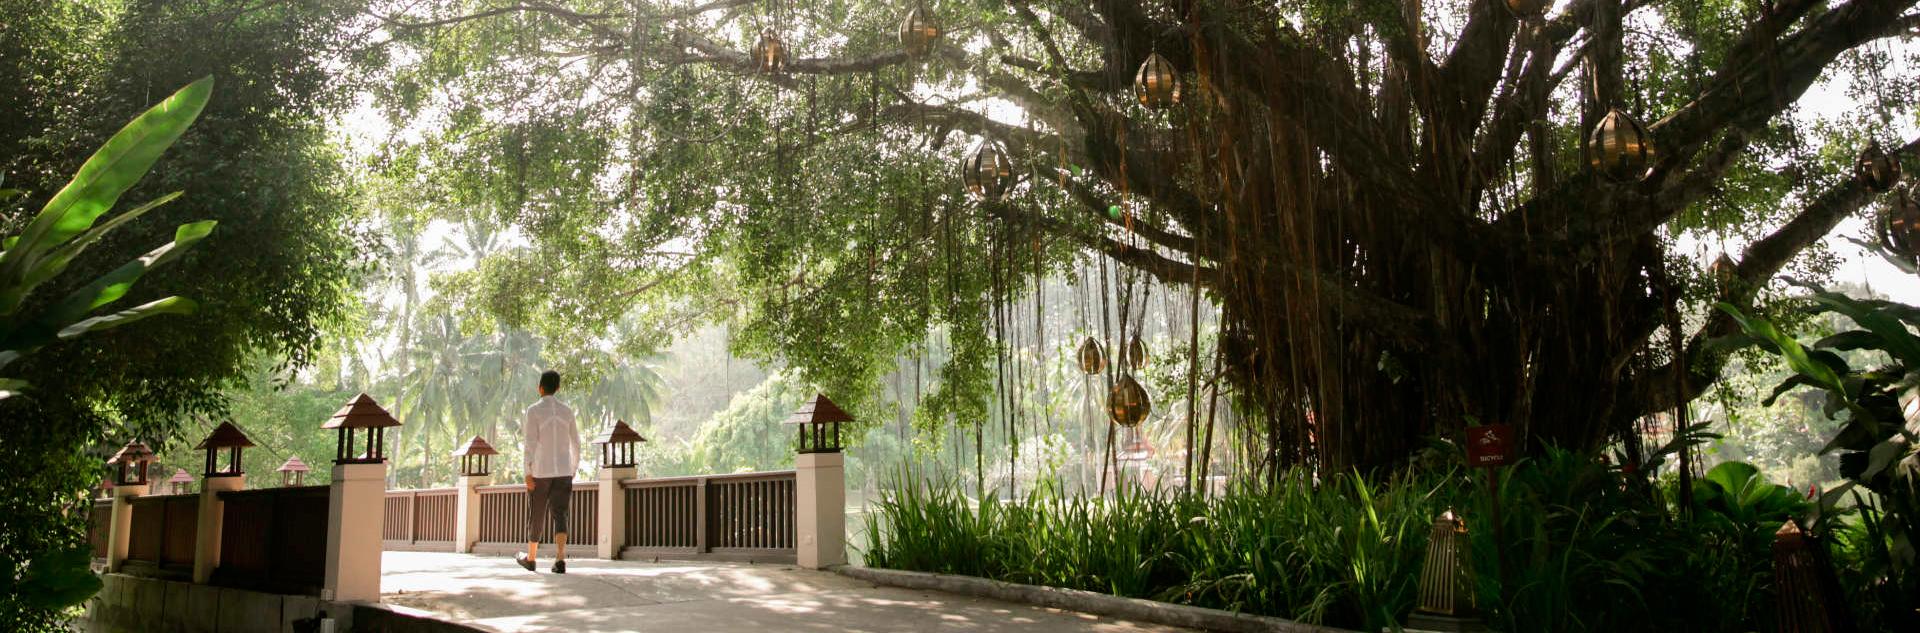 bt-spa-sanctuary-our-resort-hero_1920x633